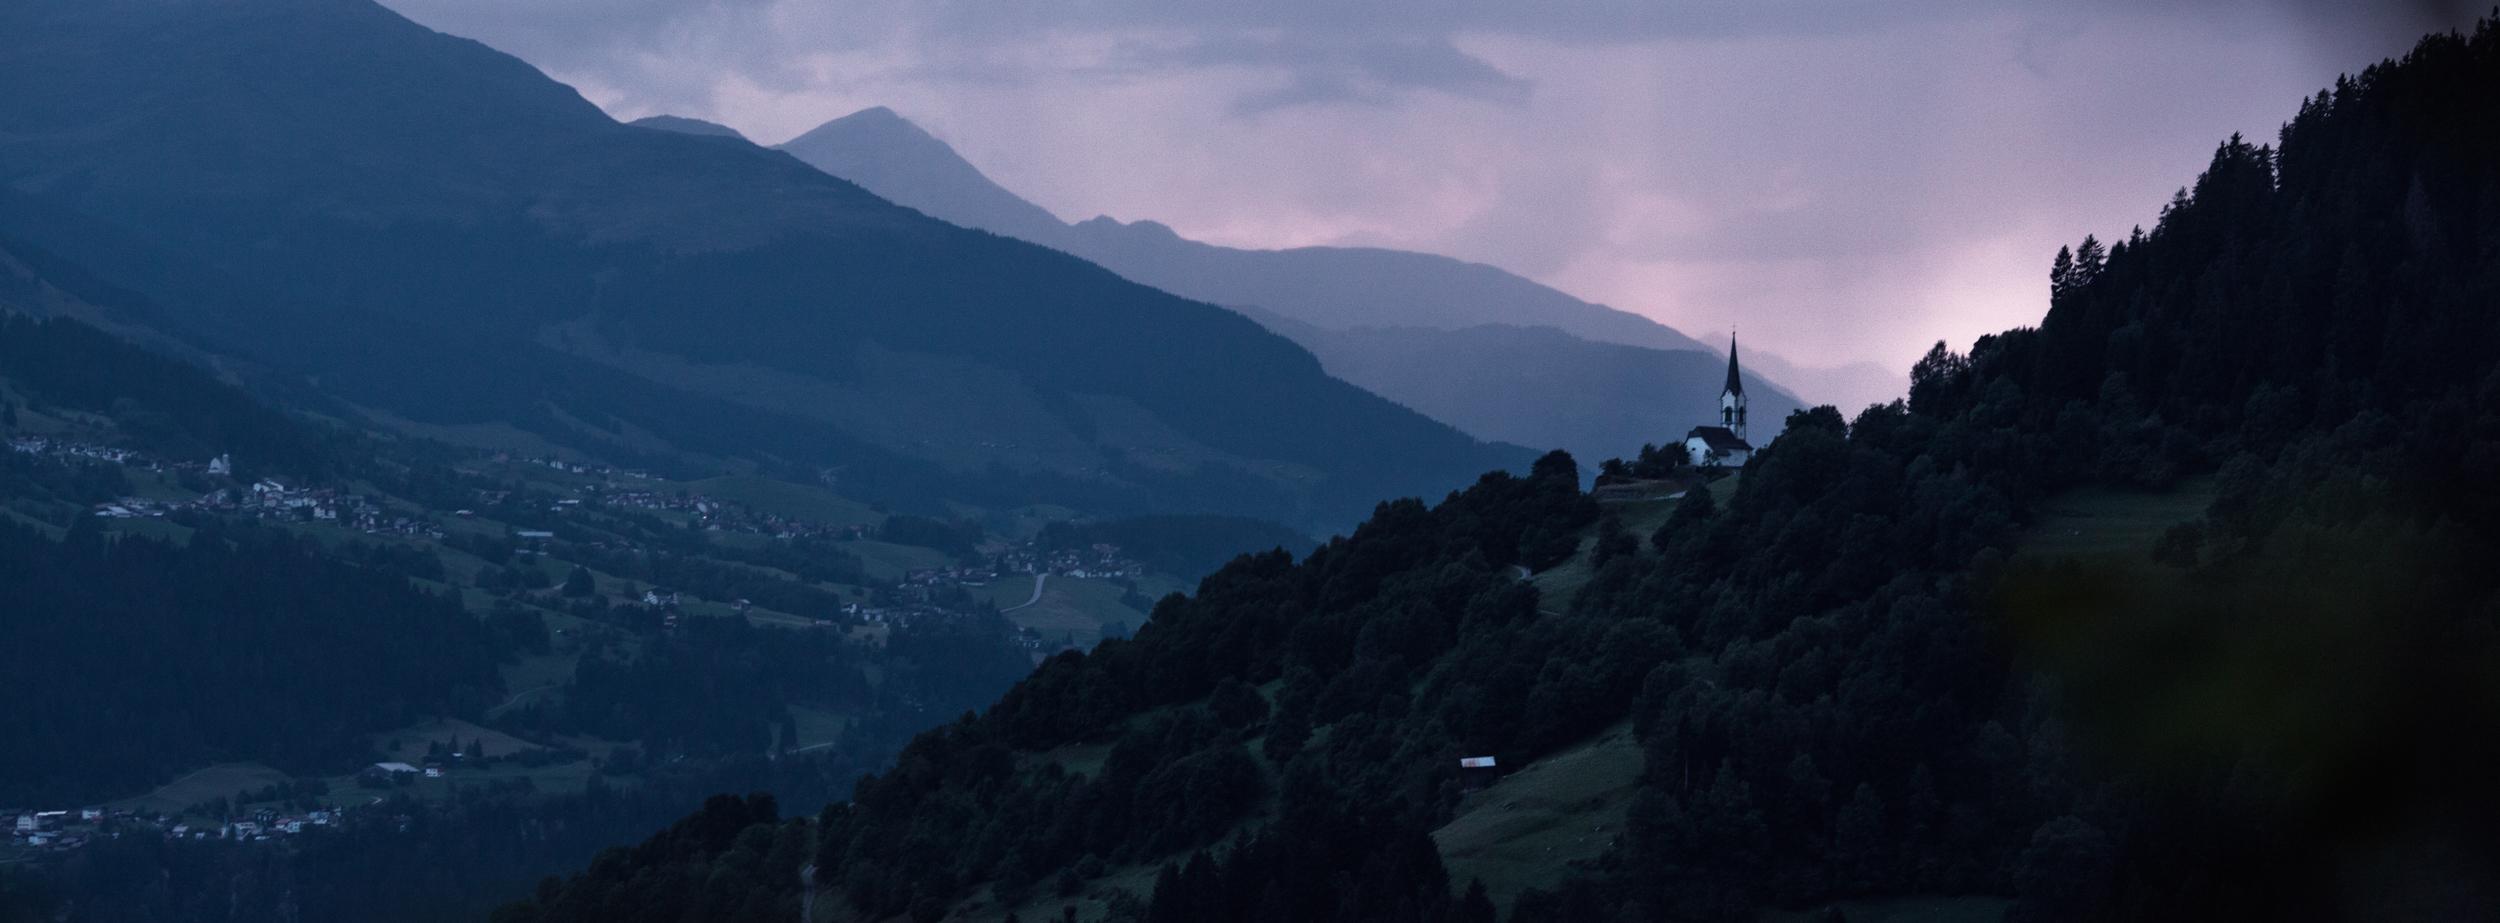 TomKluyver_Switzerland-3.jpg